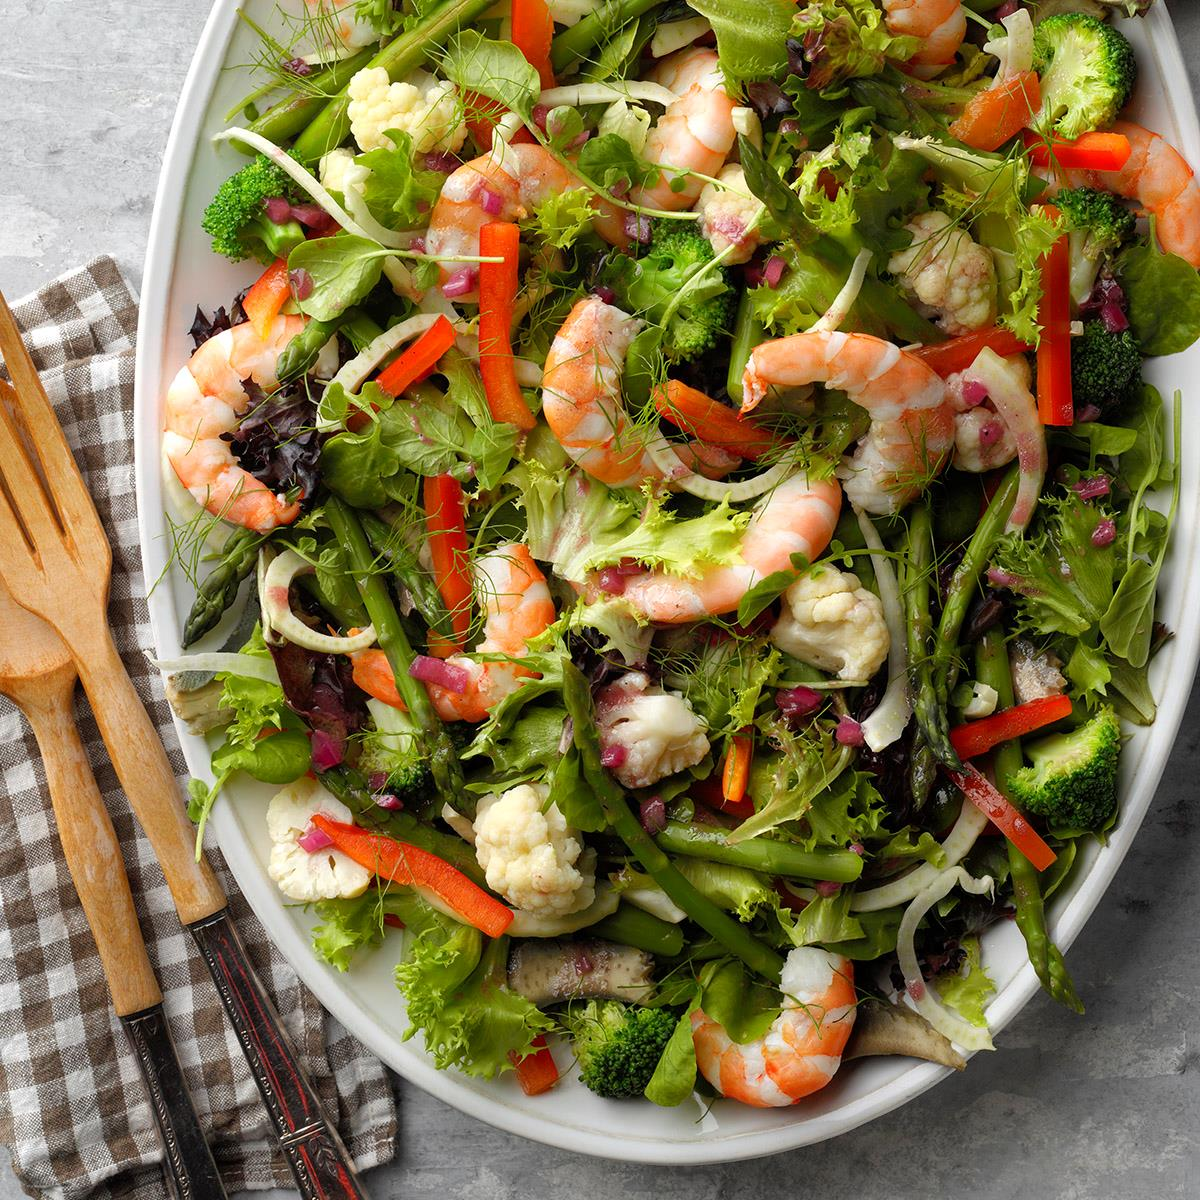 Recipe Shrimp Salad With Vinaigrette Dressing